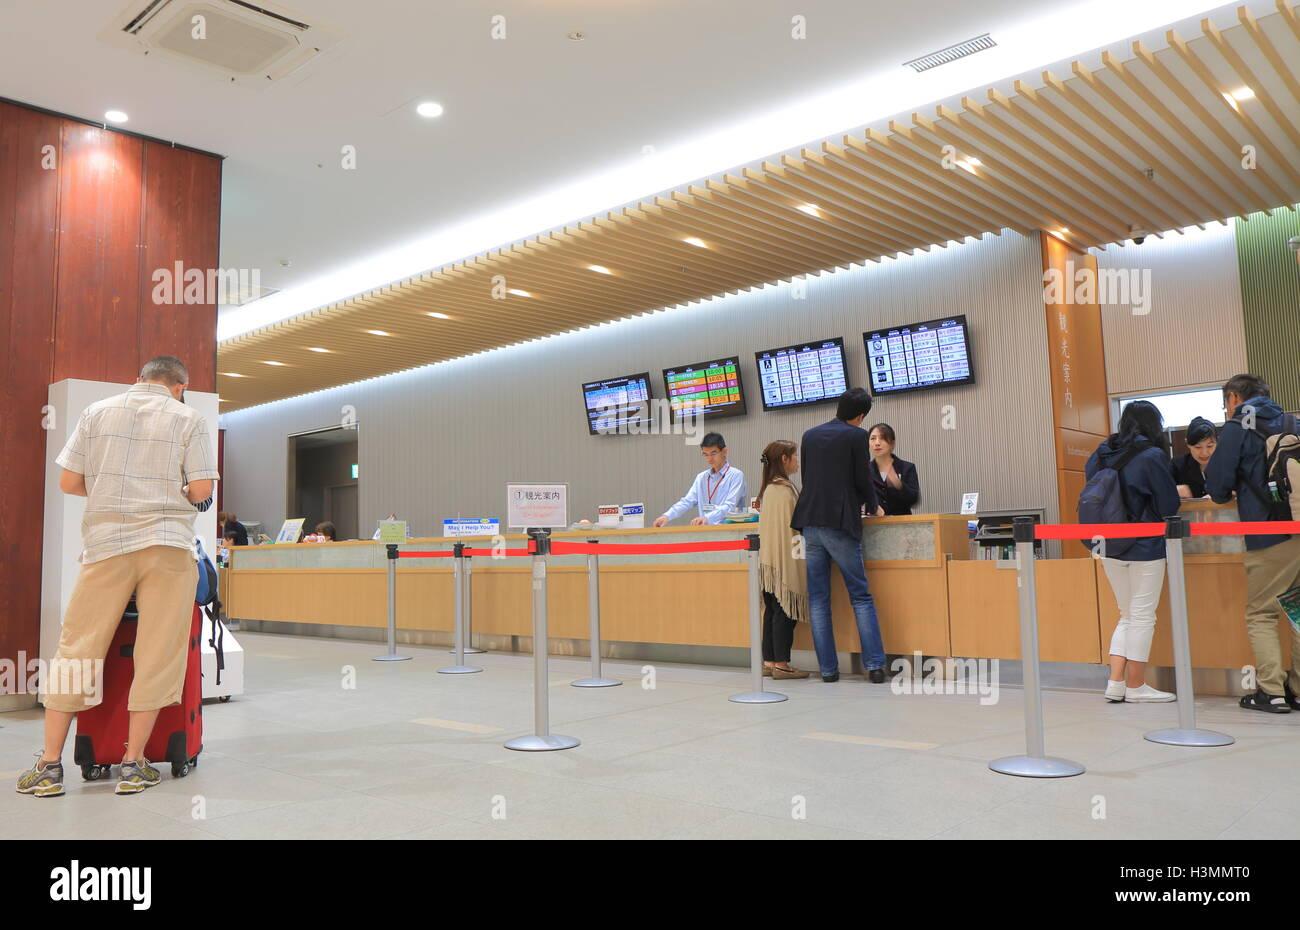 People visit tourist information centre at Kanazawa train station in Kanazawa Japan - Stock Image